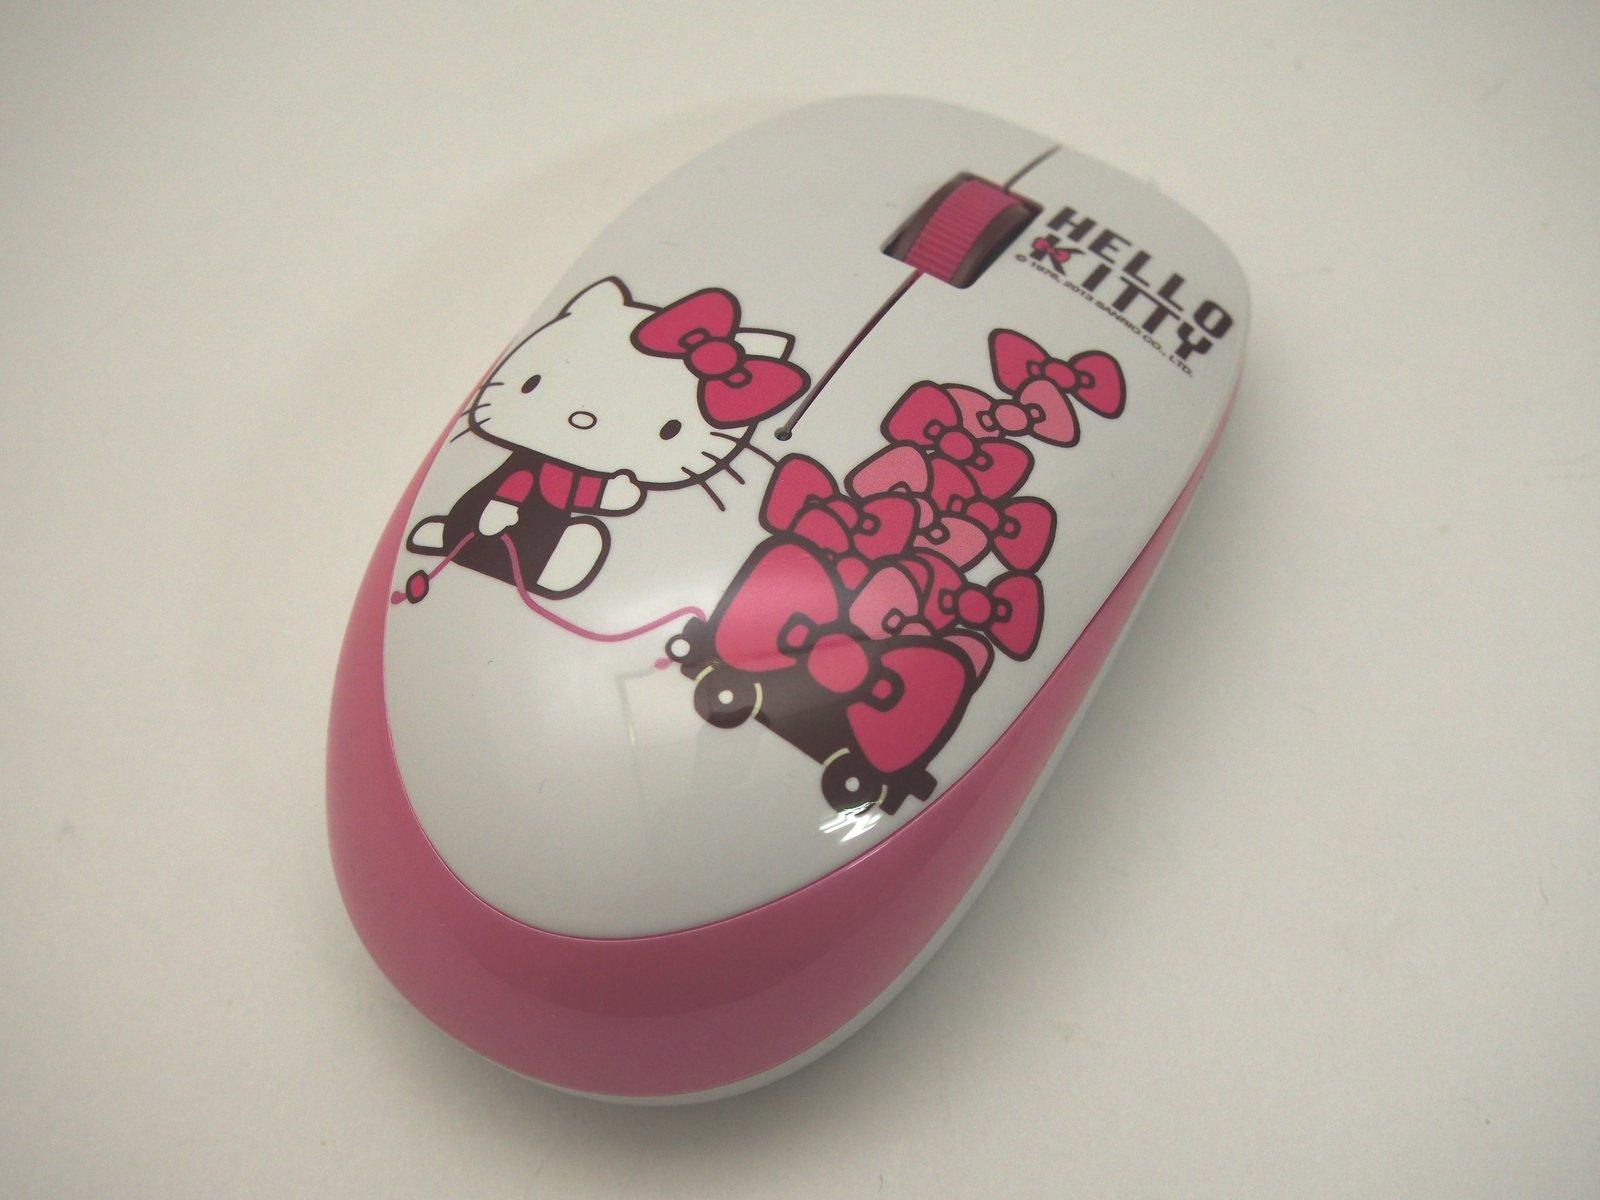 [XF] 喚起內心無限的可愛少女心 B.FRiEND Hello Kitty 無線鍵盤滑鼠組